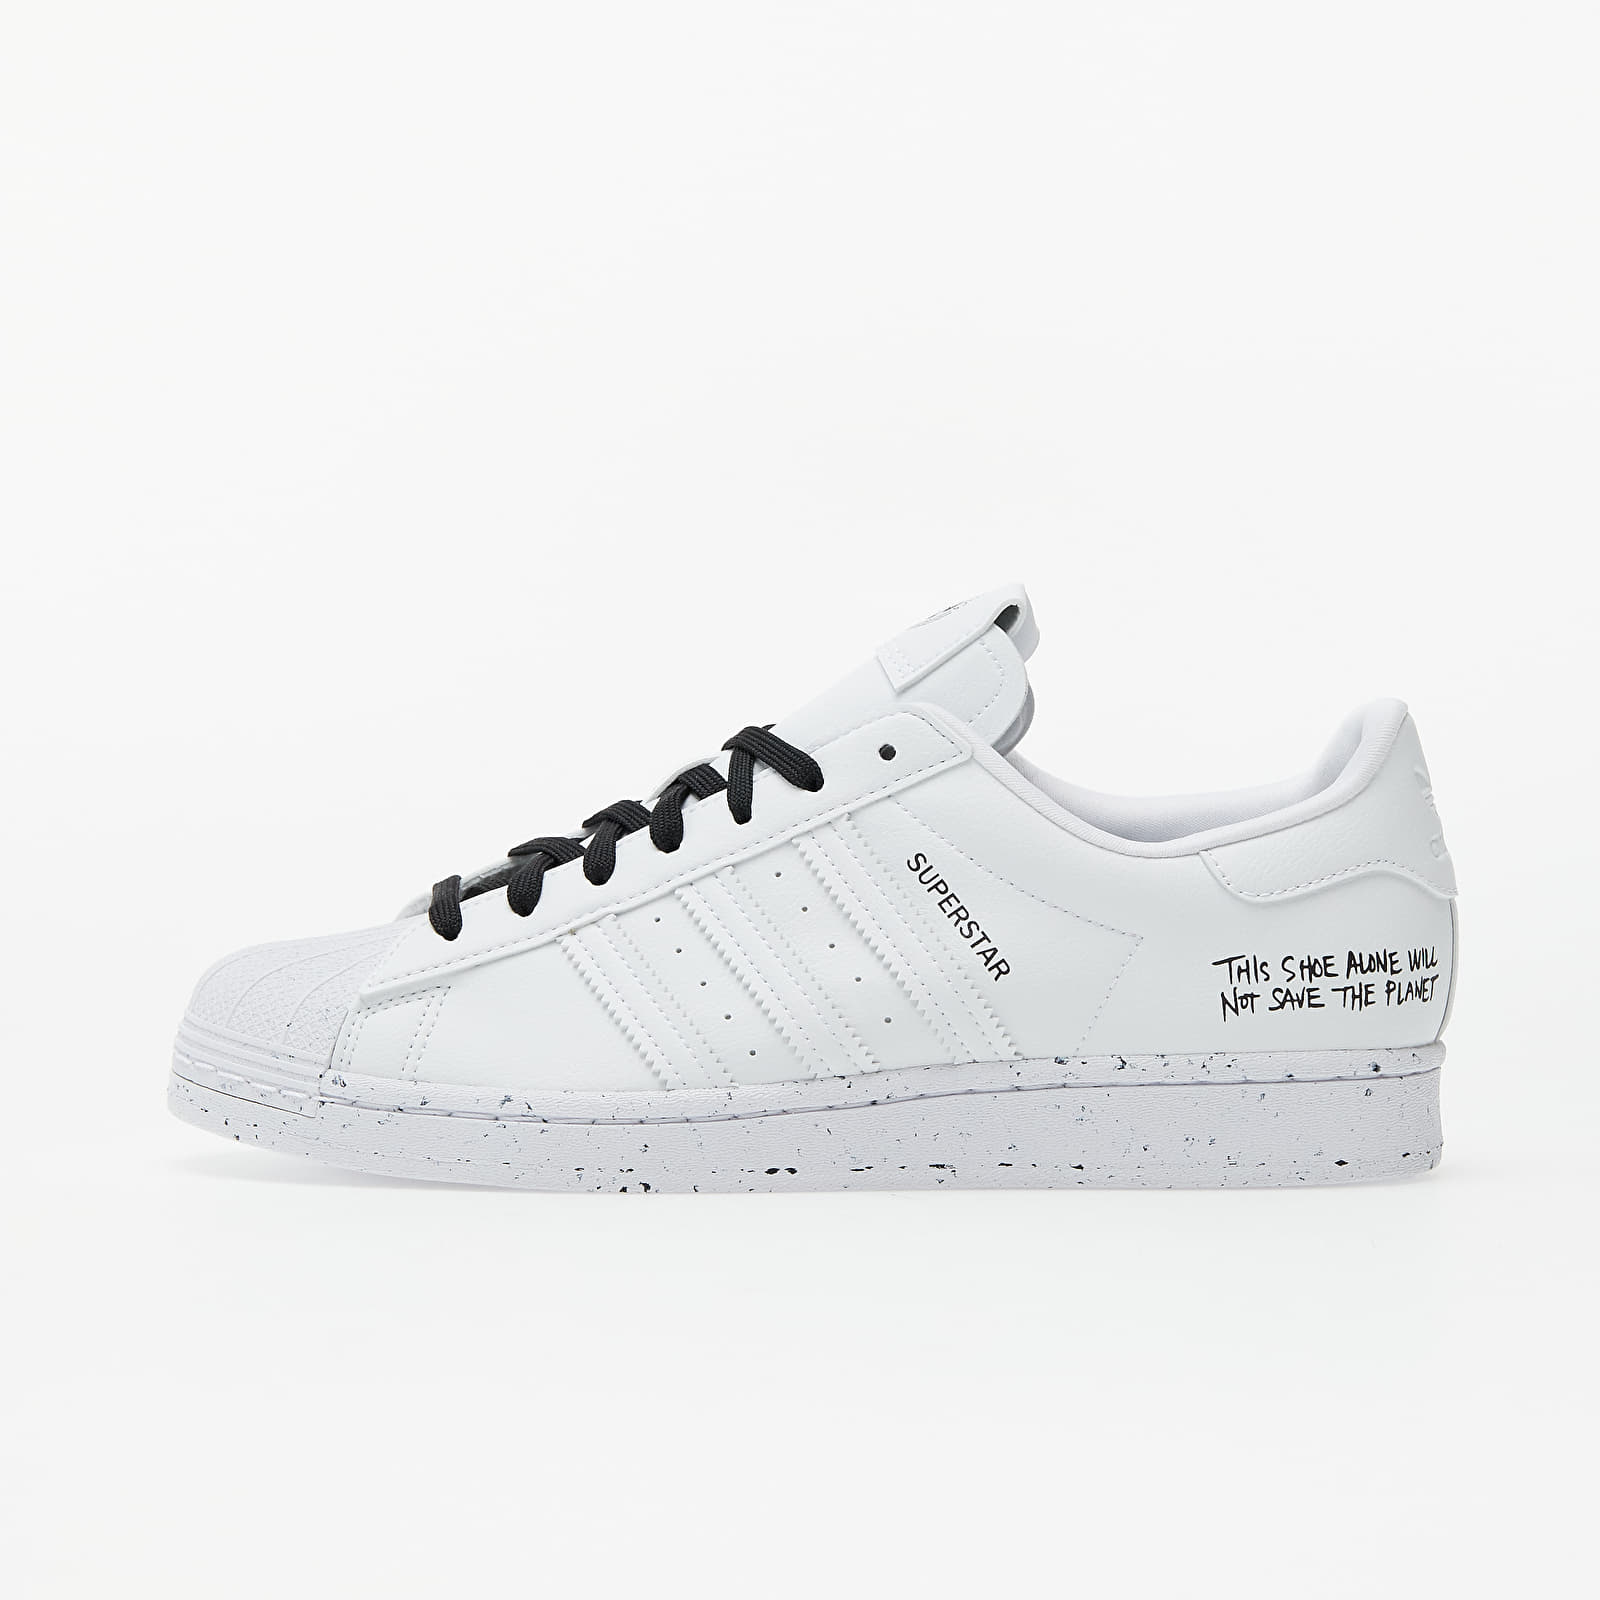 Pánske tenisky a topánky adidas Superstar Clean Classics Ftw White/ Ftw White/ Core Black